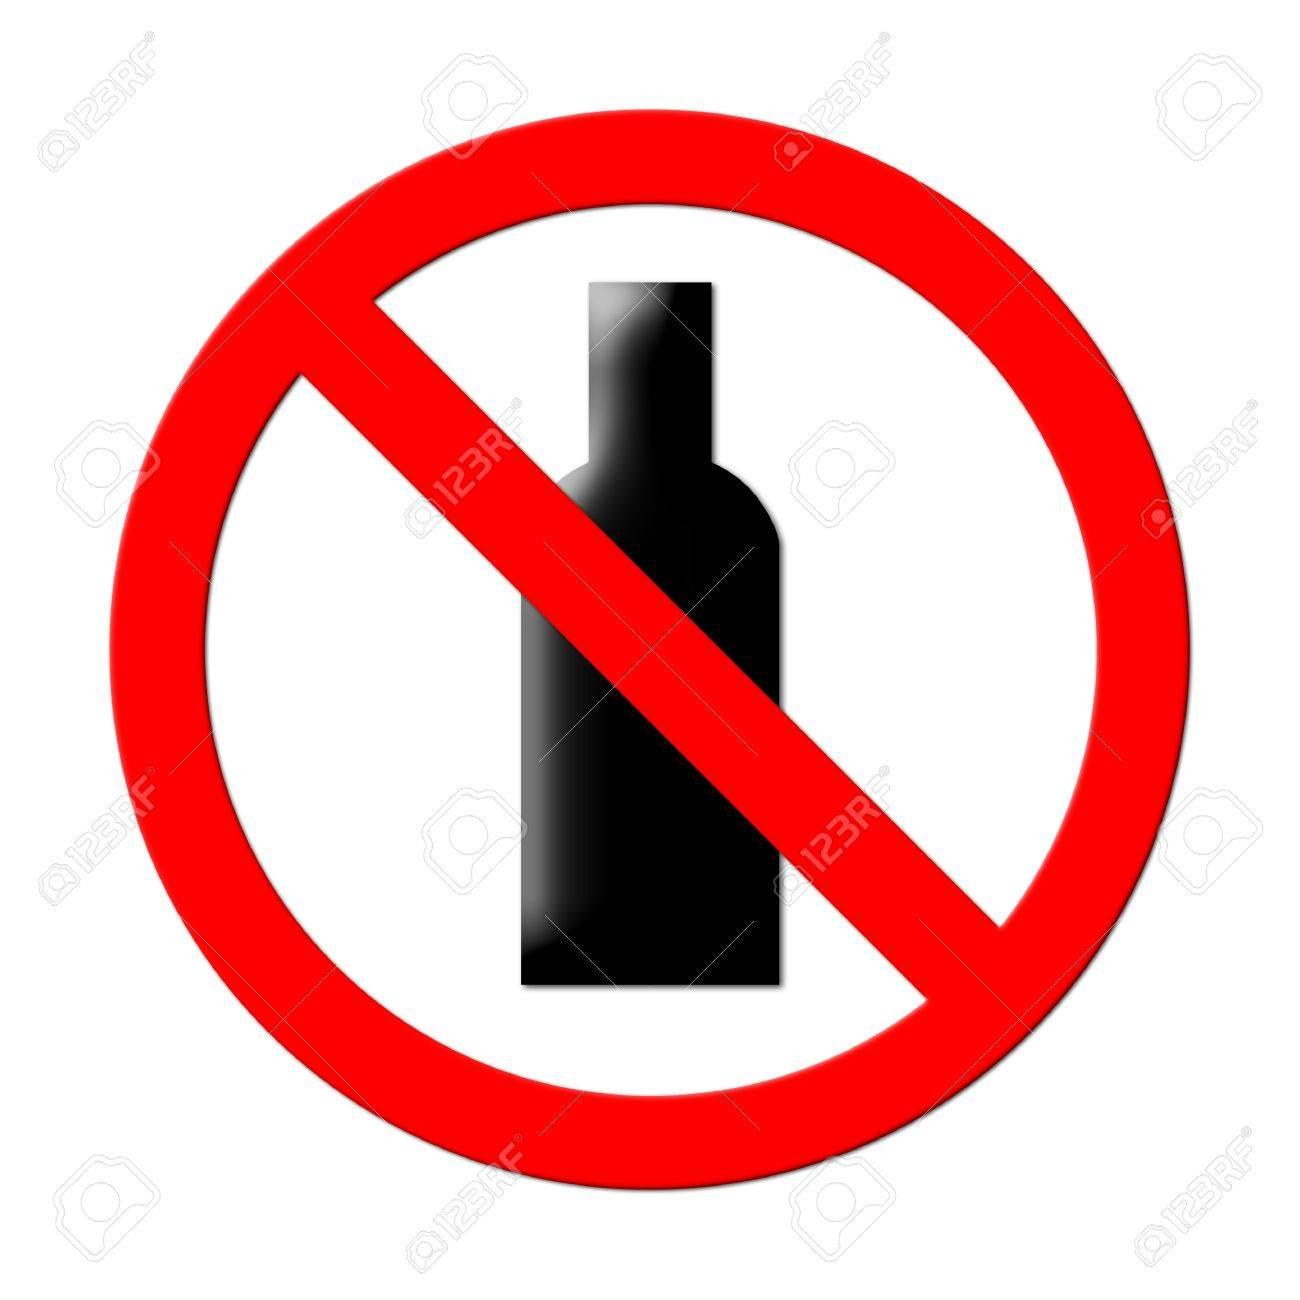 no alcohol sign on white background Stock Photo - 17103976